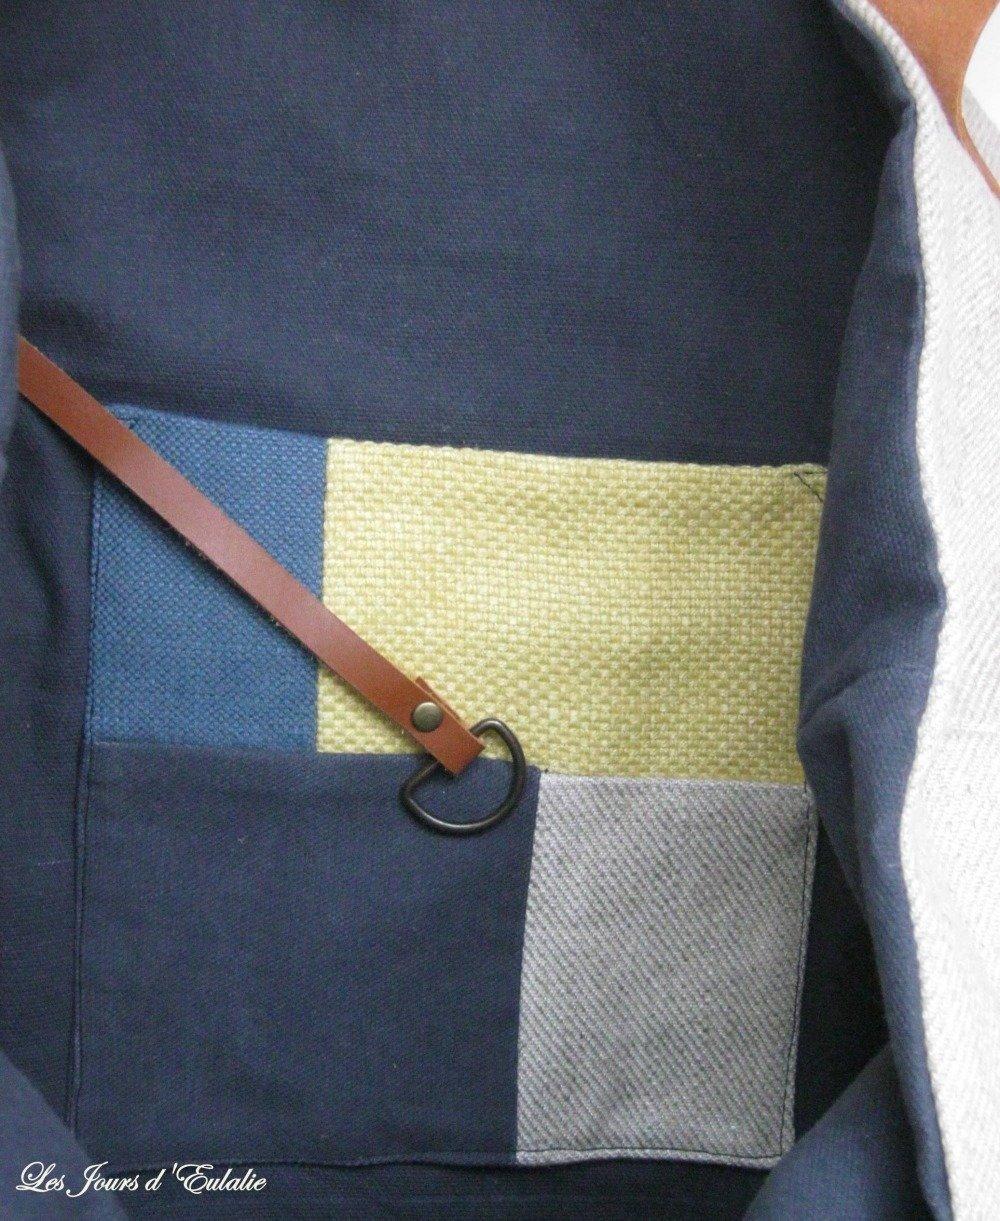 Grand sac cabas Métis multicolore.